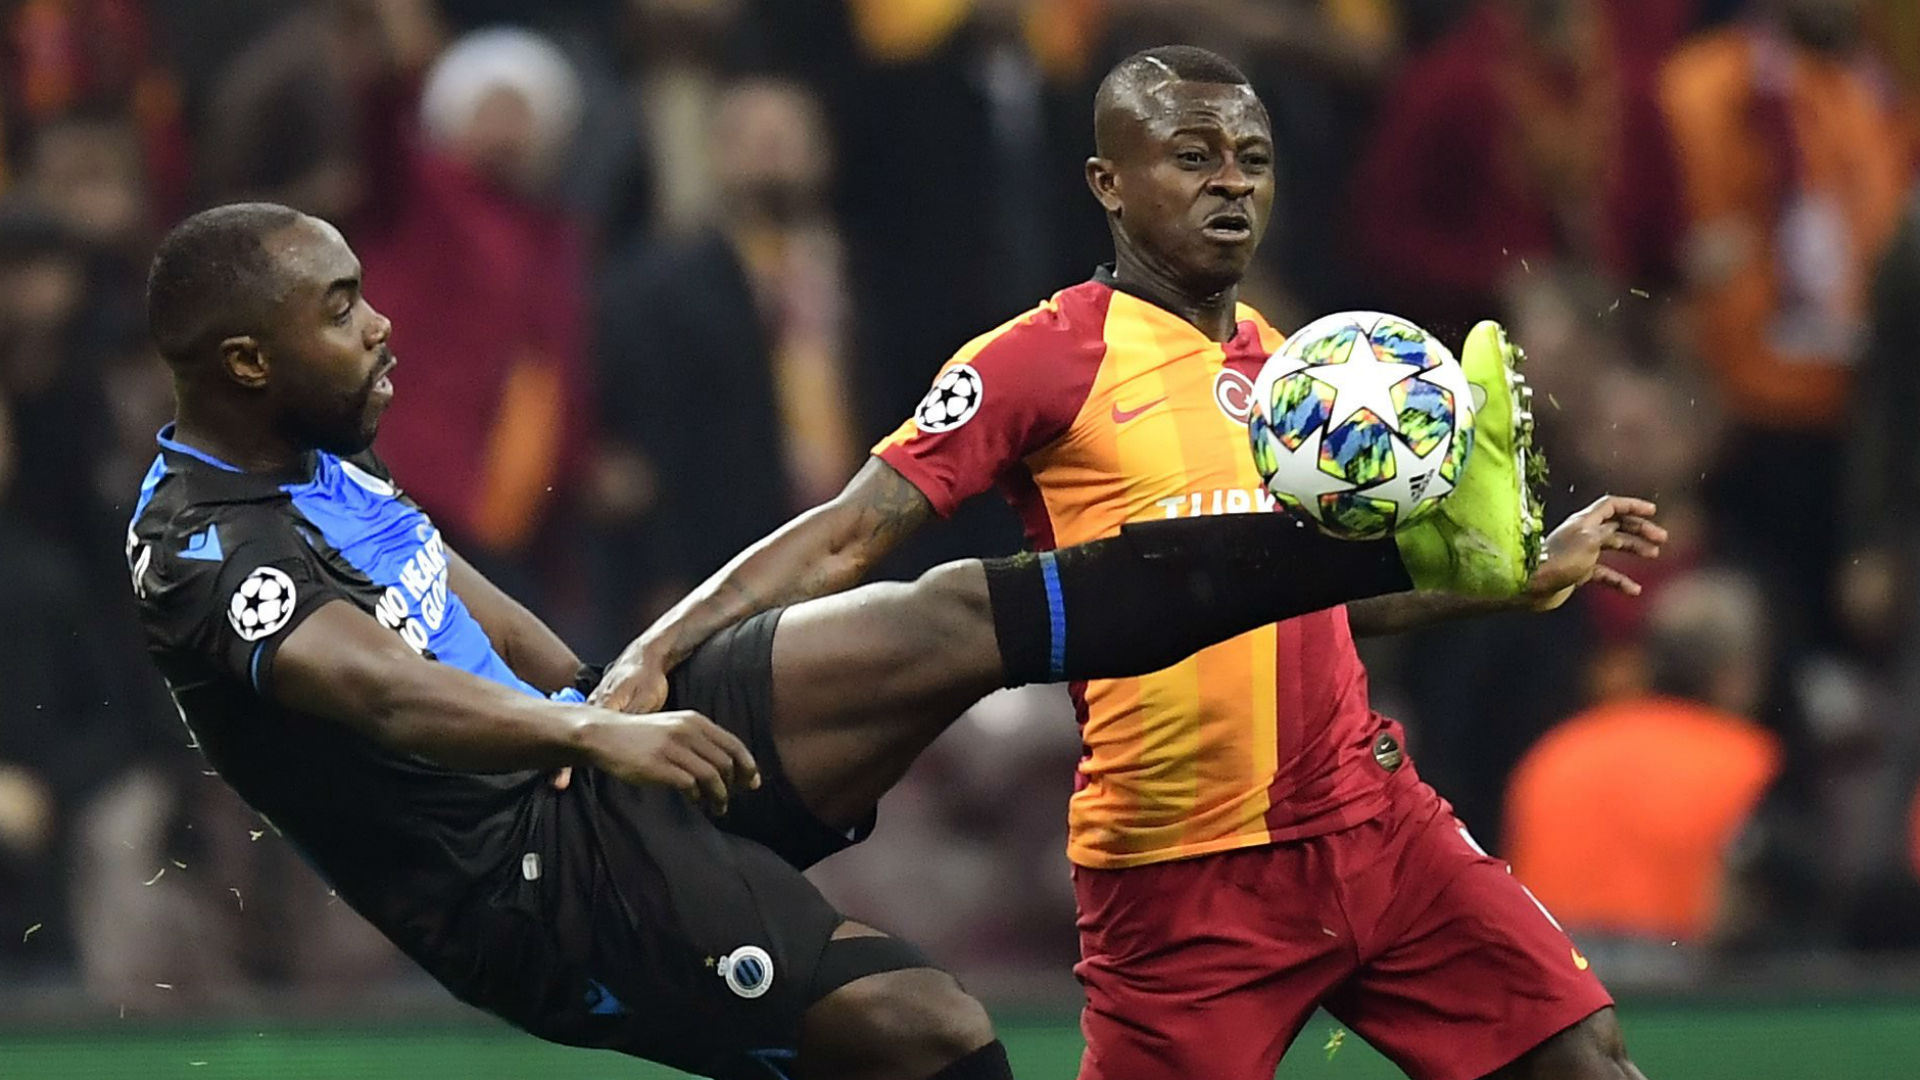 Galatasaray vs Club Brugge, Champions League